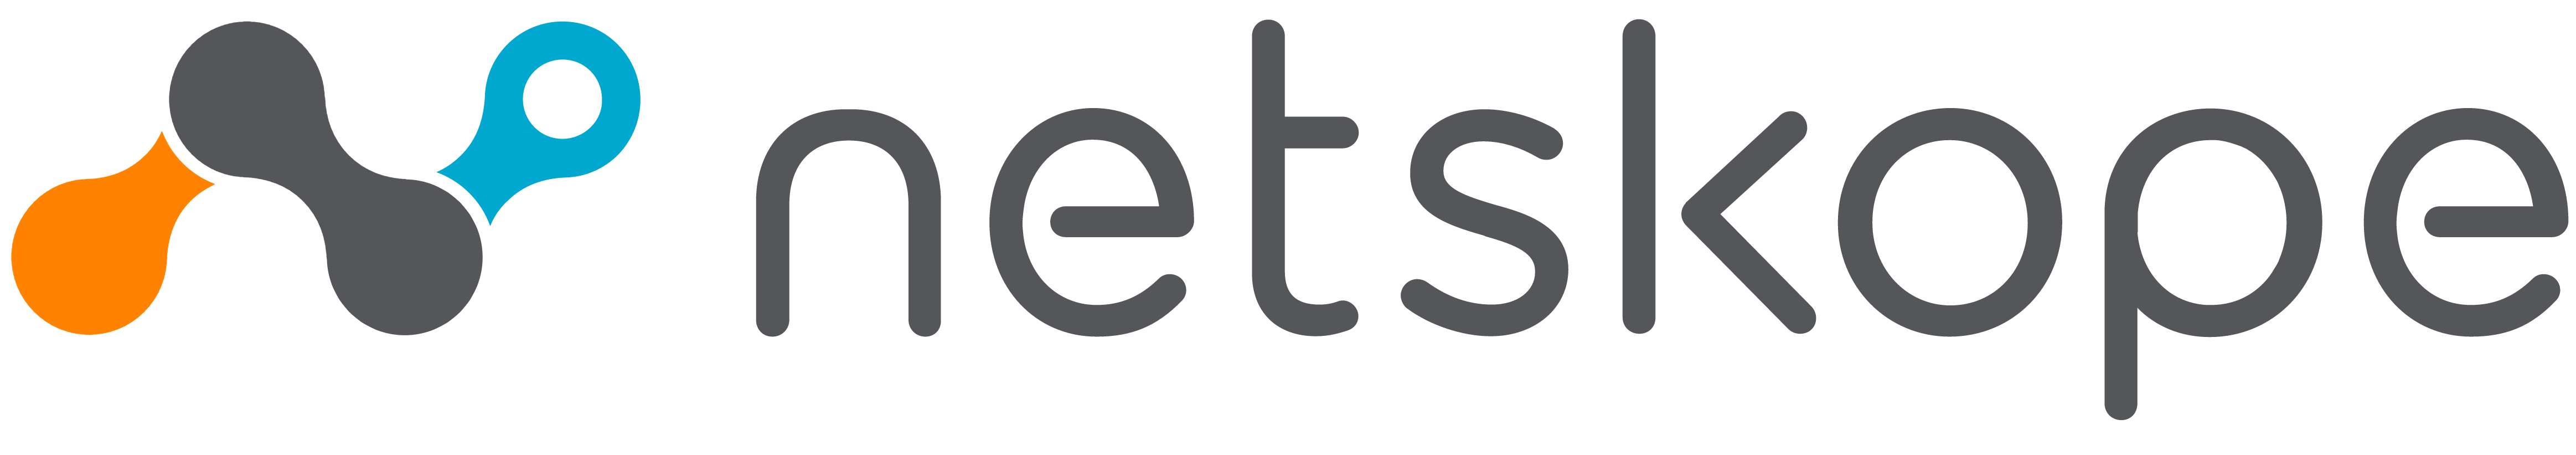 Netskope_logo_logotype